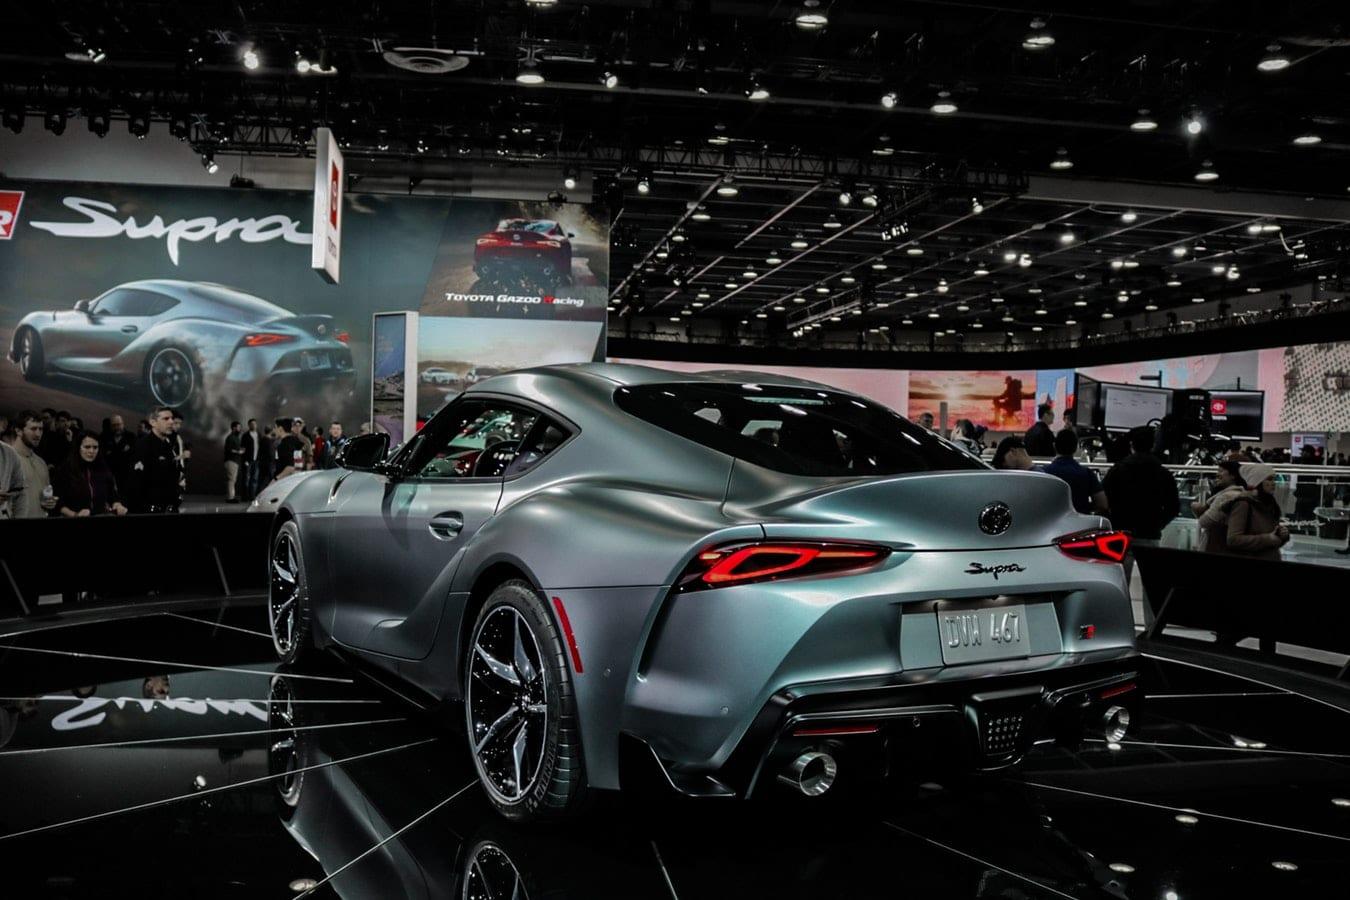 Toyota Supra 2019 at unveiling show